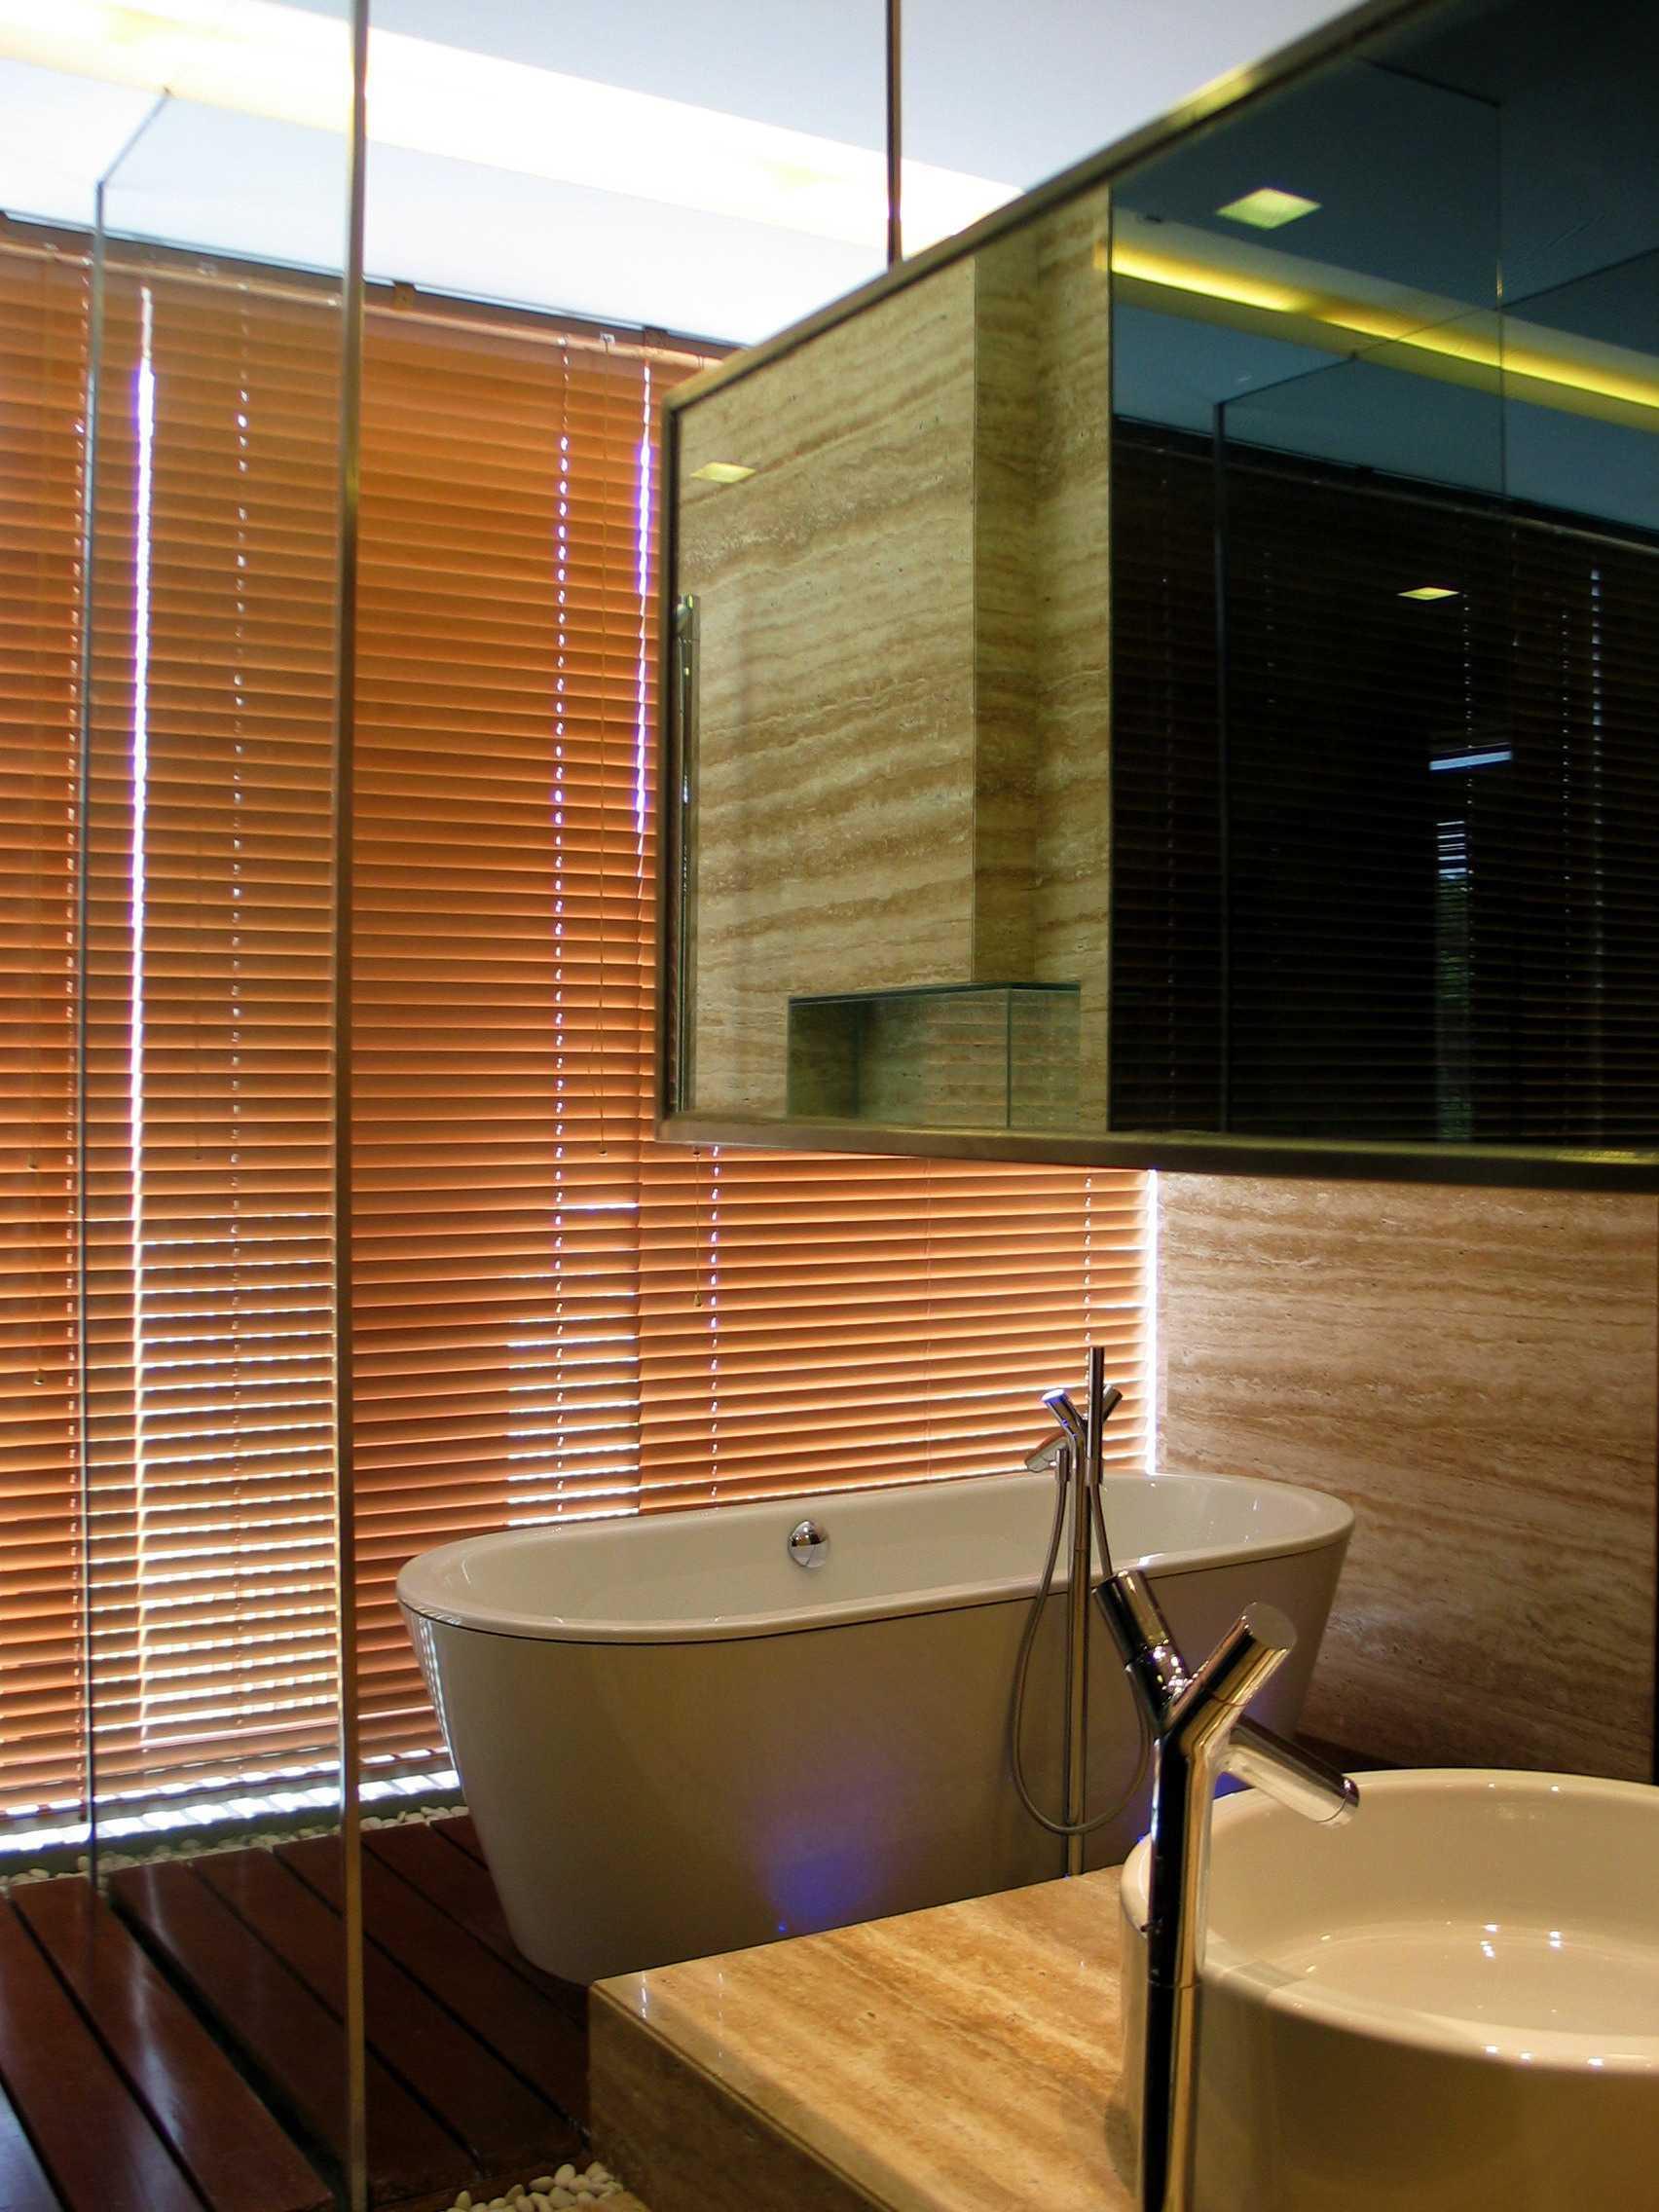 Herryj Architects Gv House Lippo Karawaci Lippo Karawaci Bathroom Tropis  23935